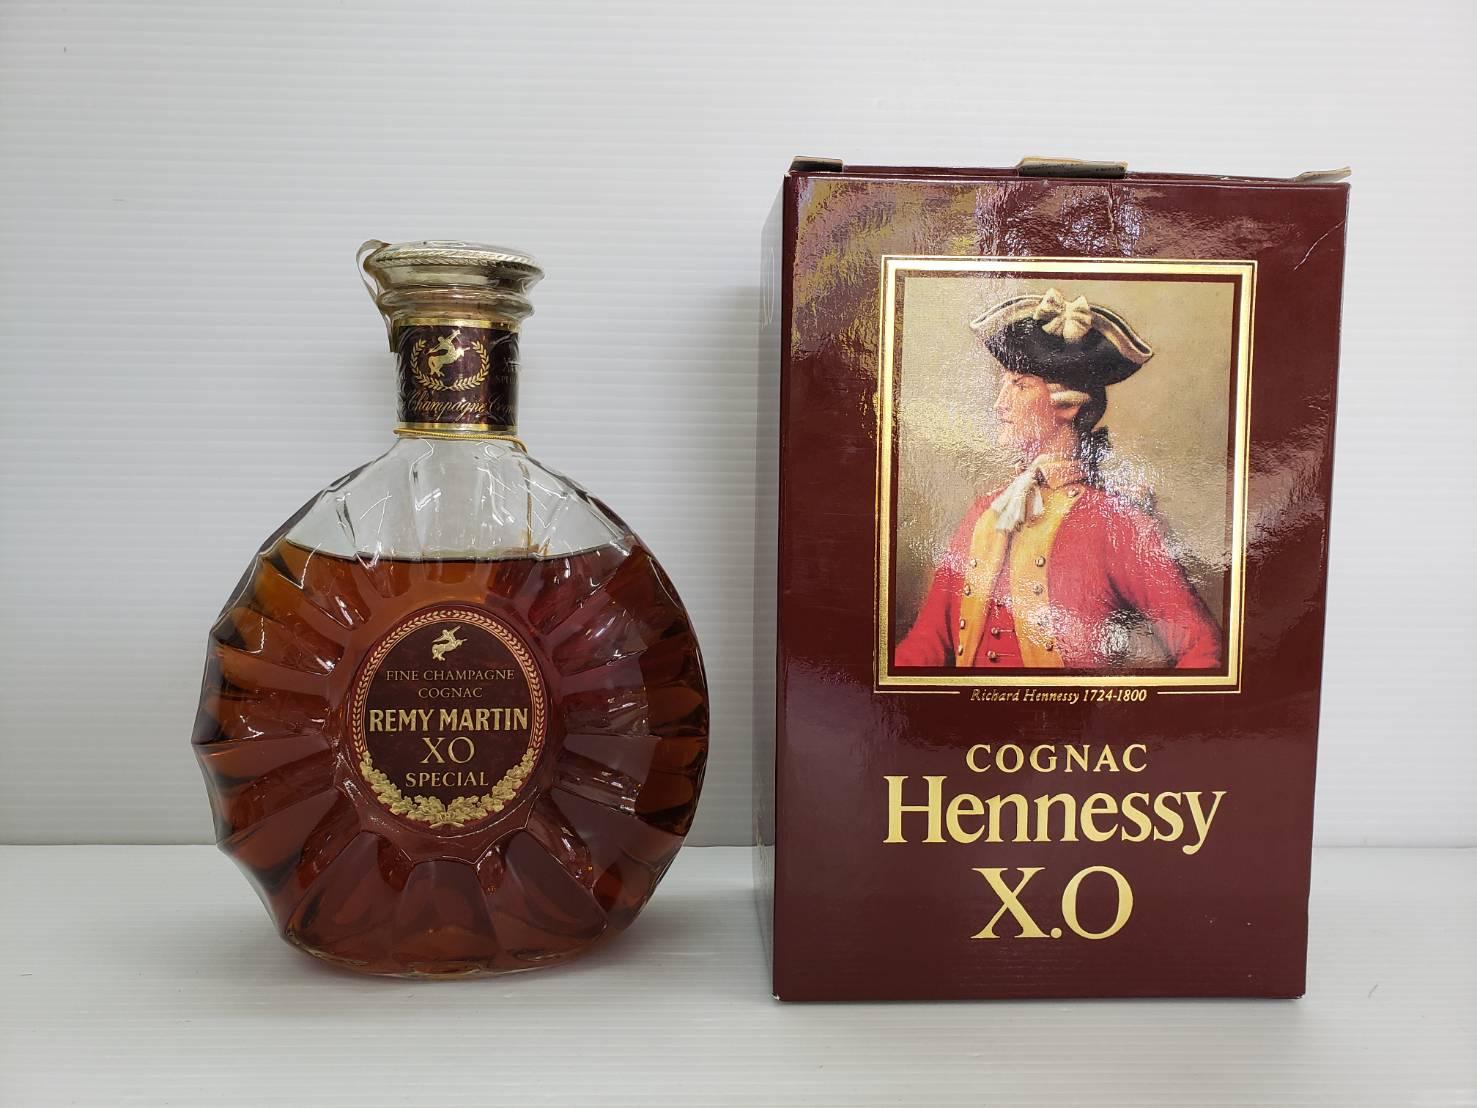 Hennessy X.O グリーンボトル 金キャップ / REMY MARTIN XO 買取致しました!の買取-